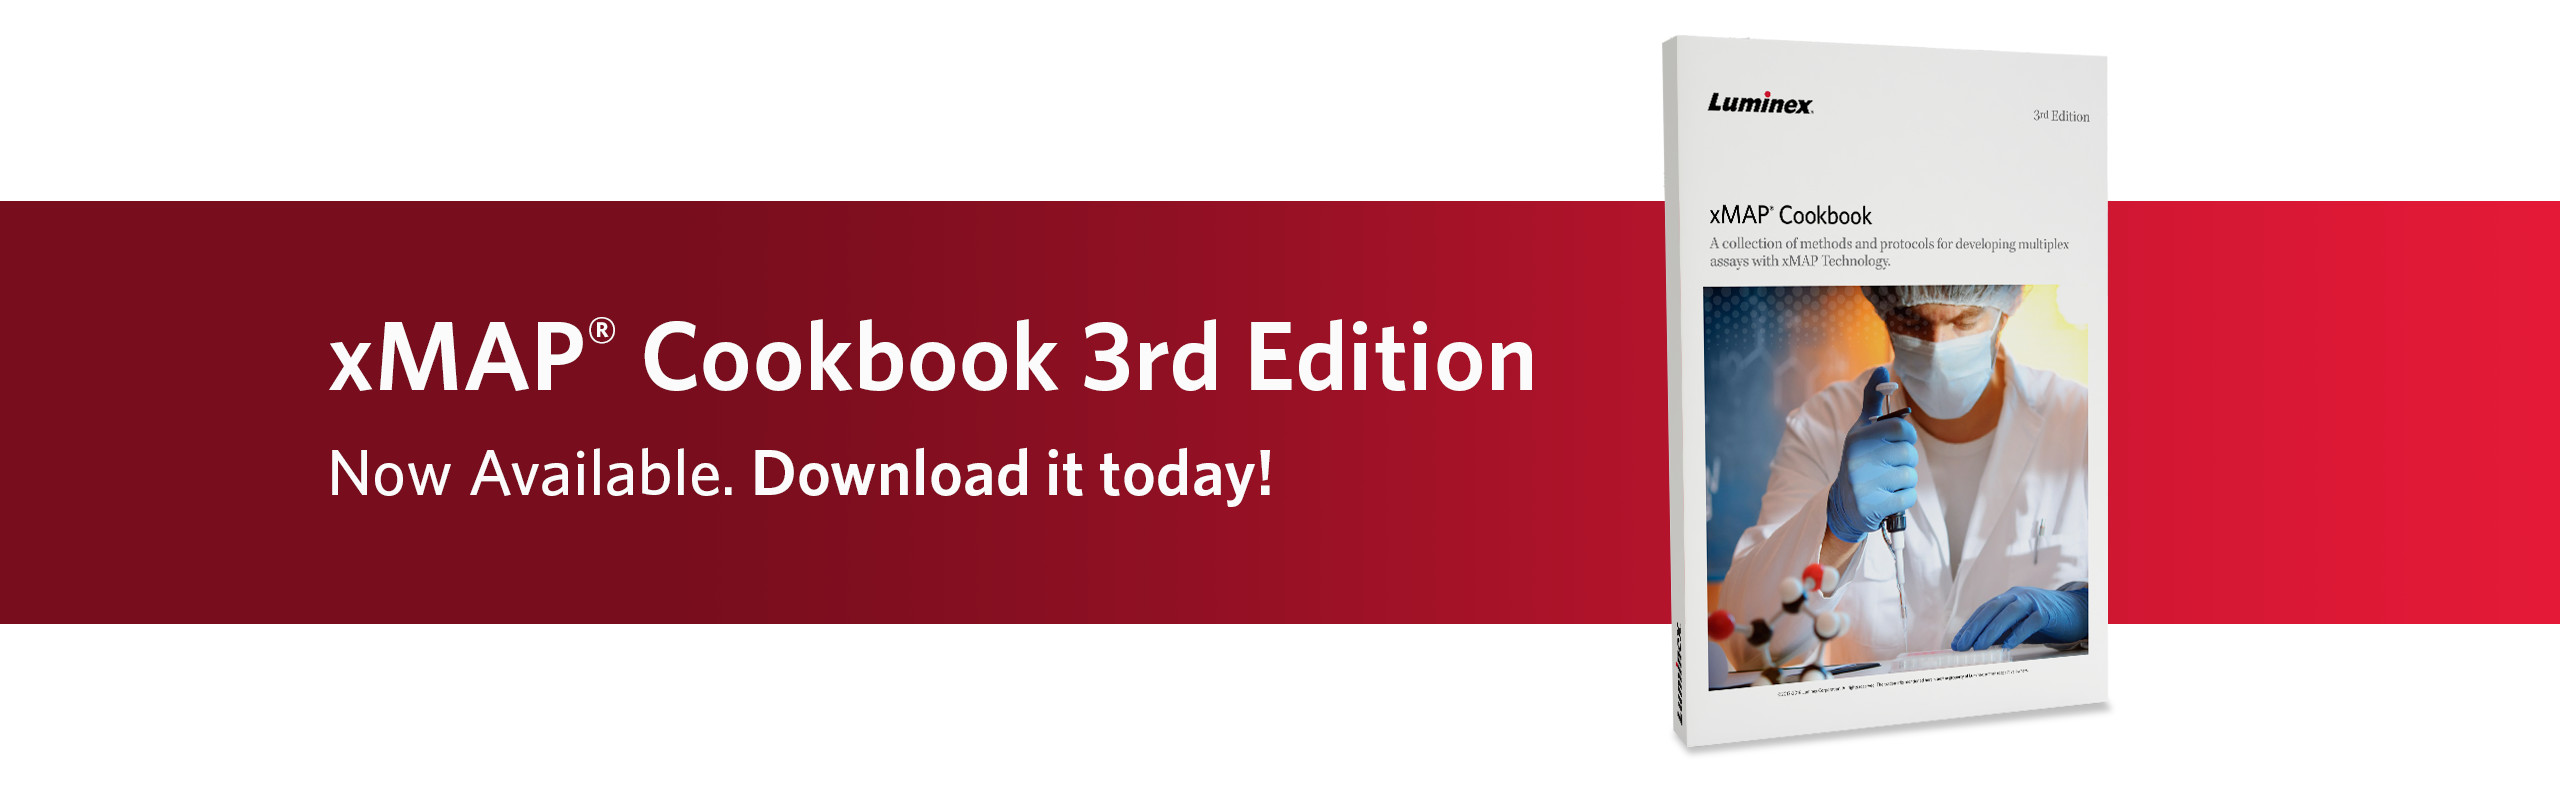 xMAP Cookbook 3rd Edition